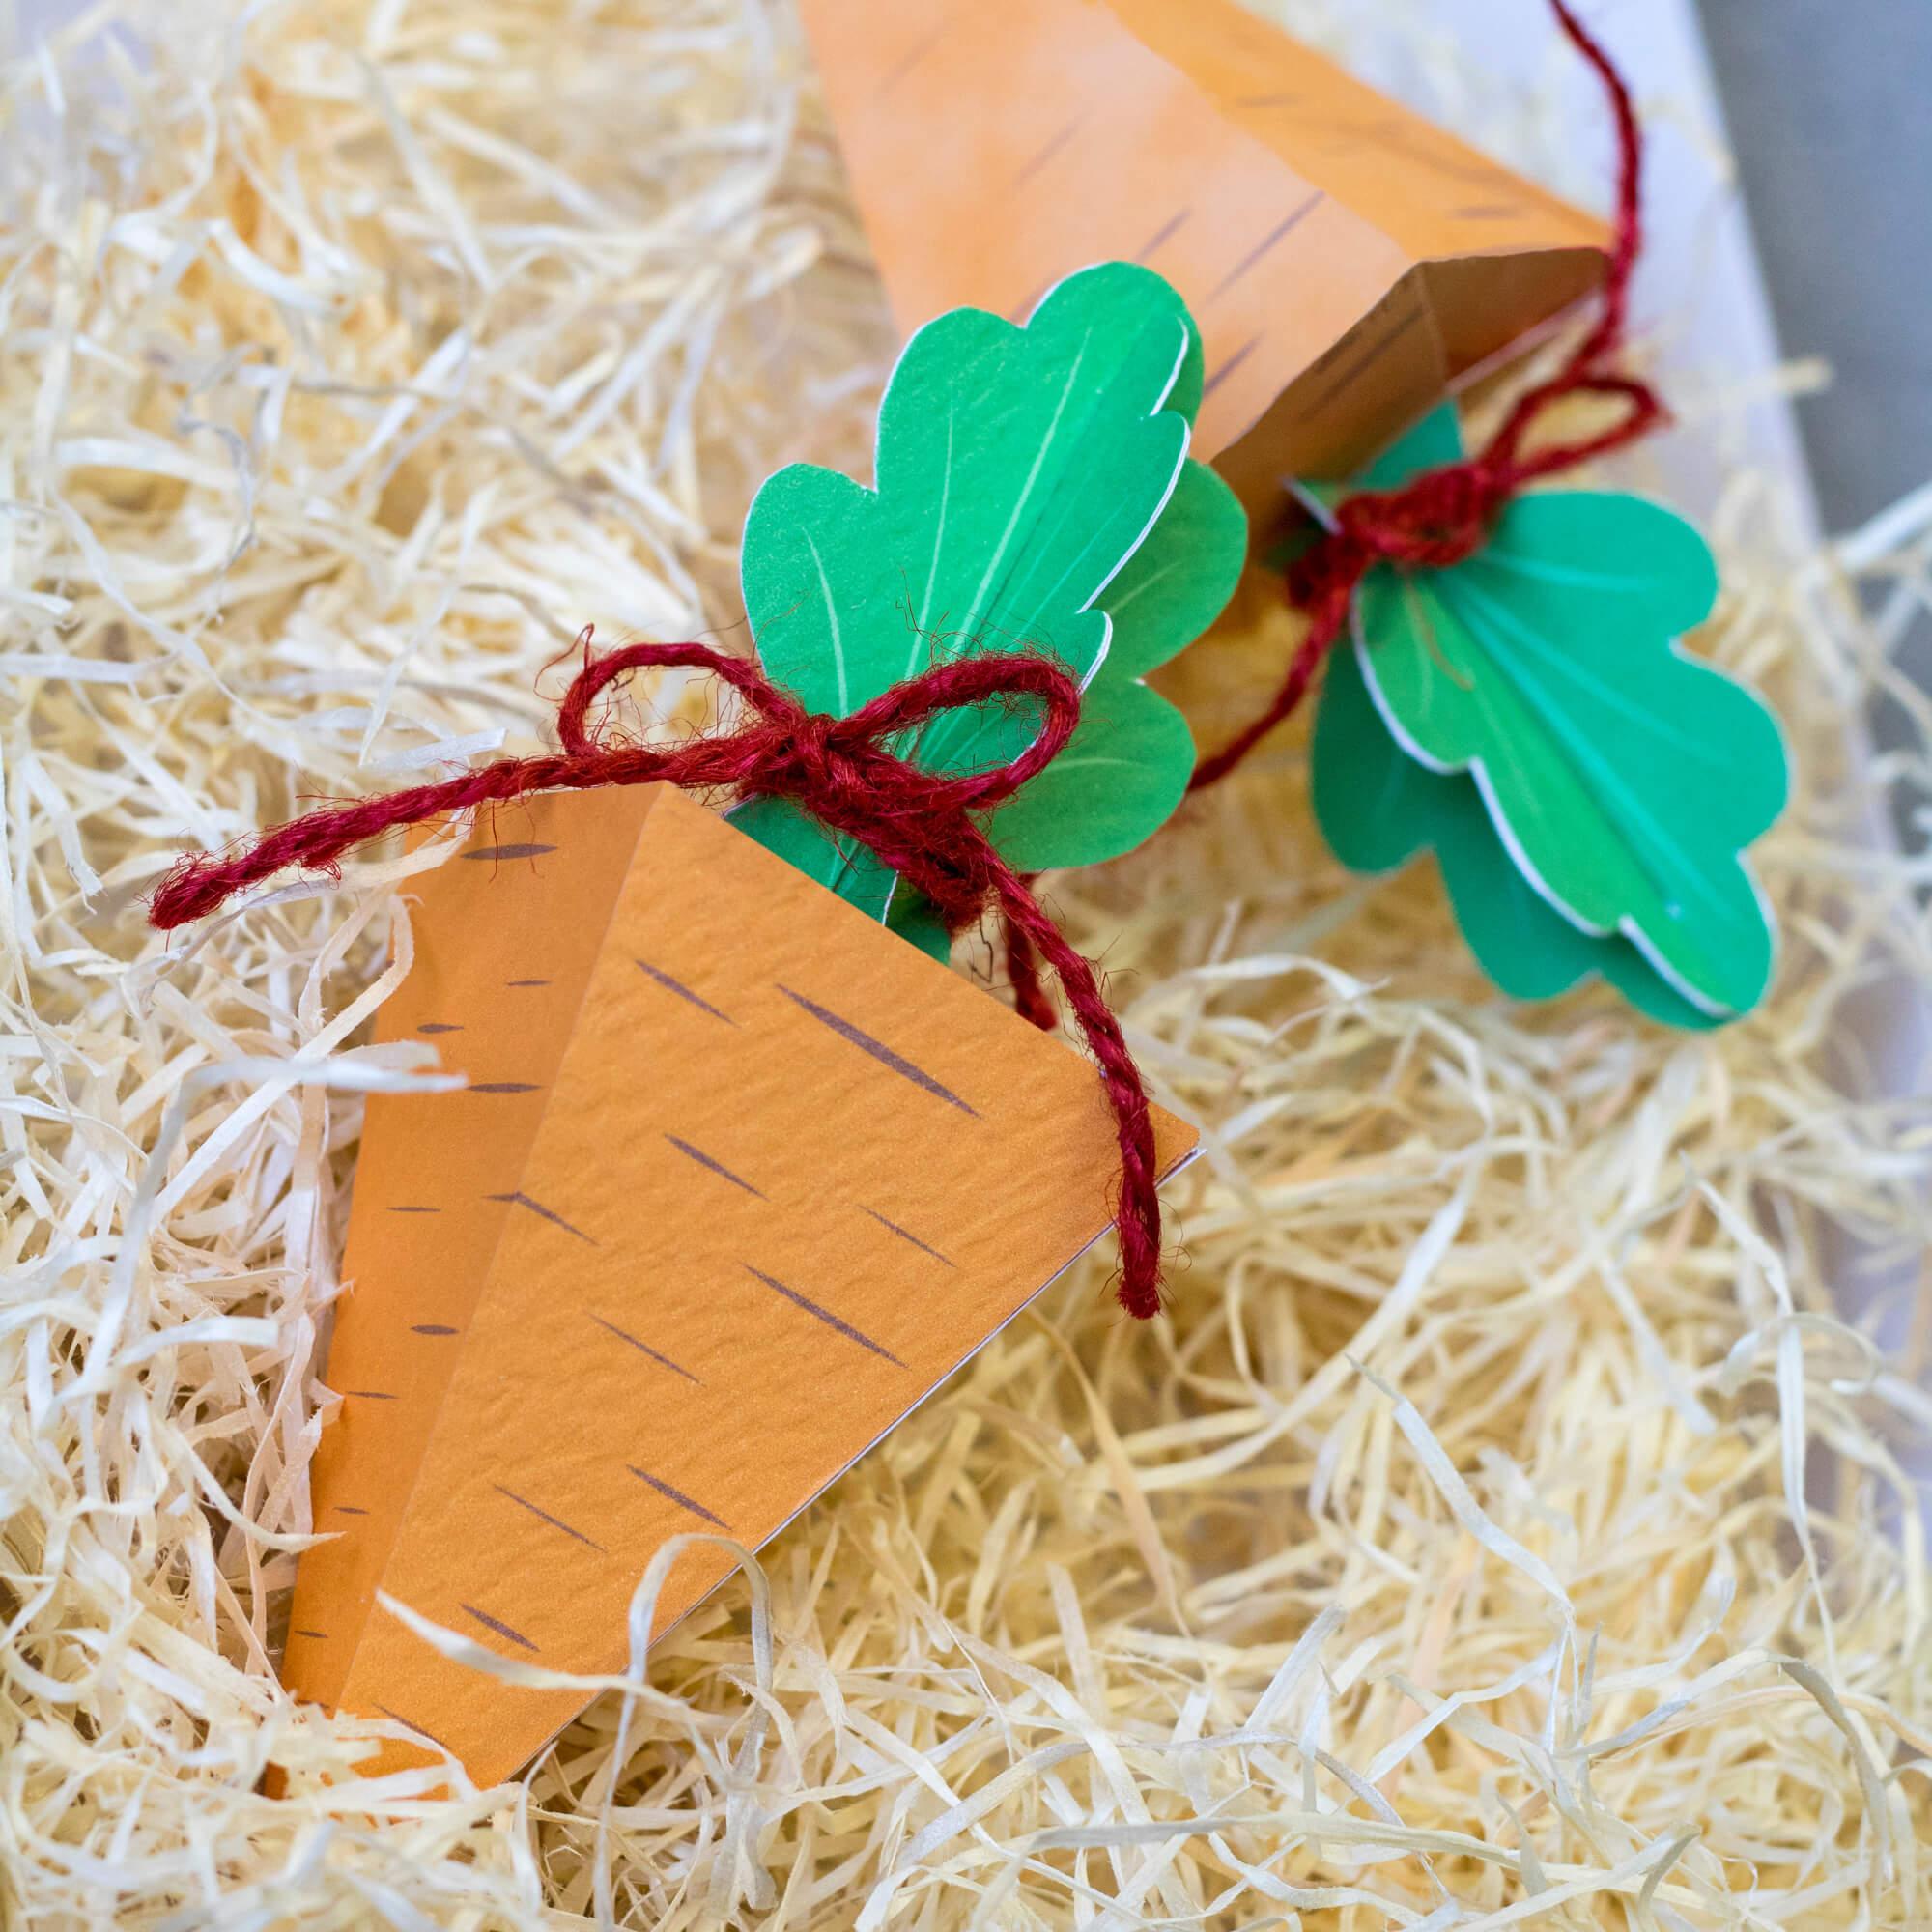 Velikonoční krabička - Vyrobte si sami